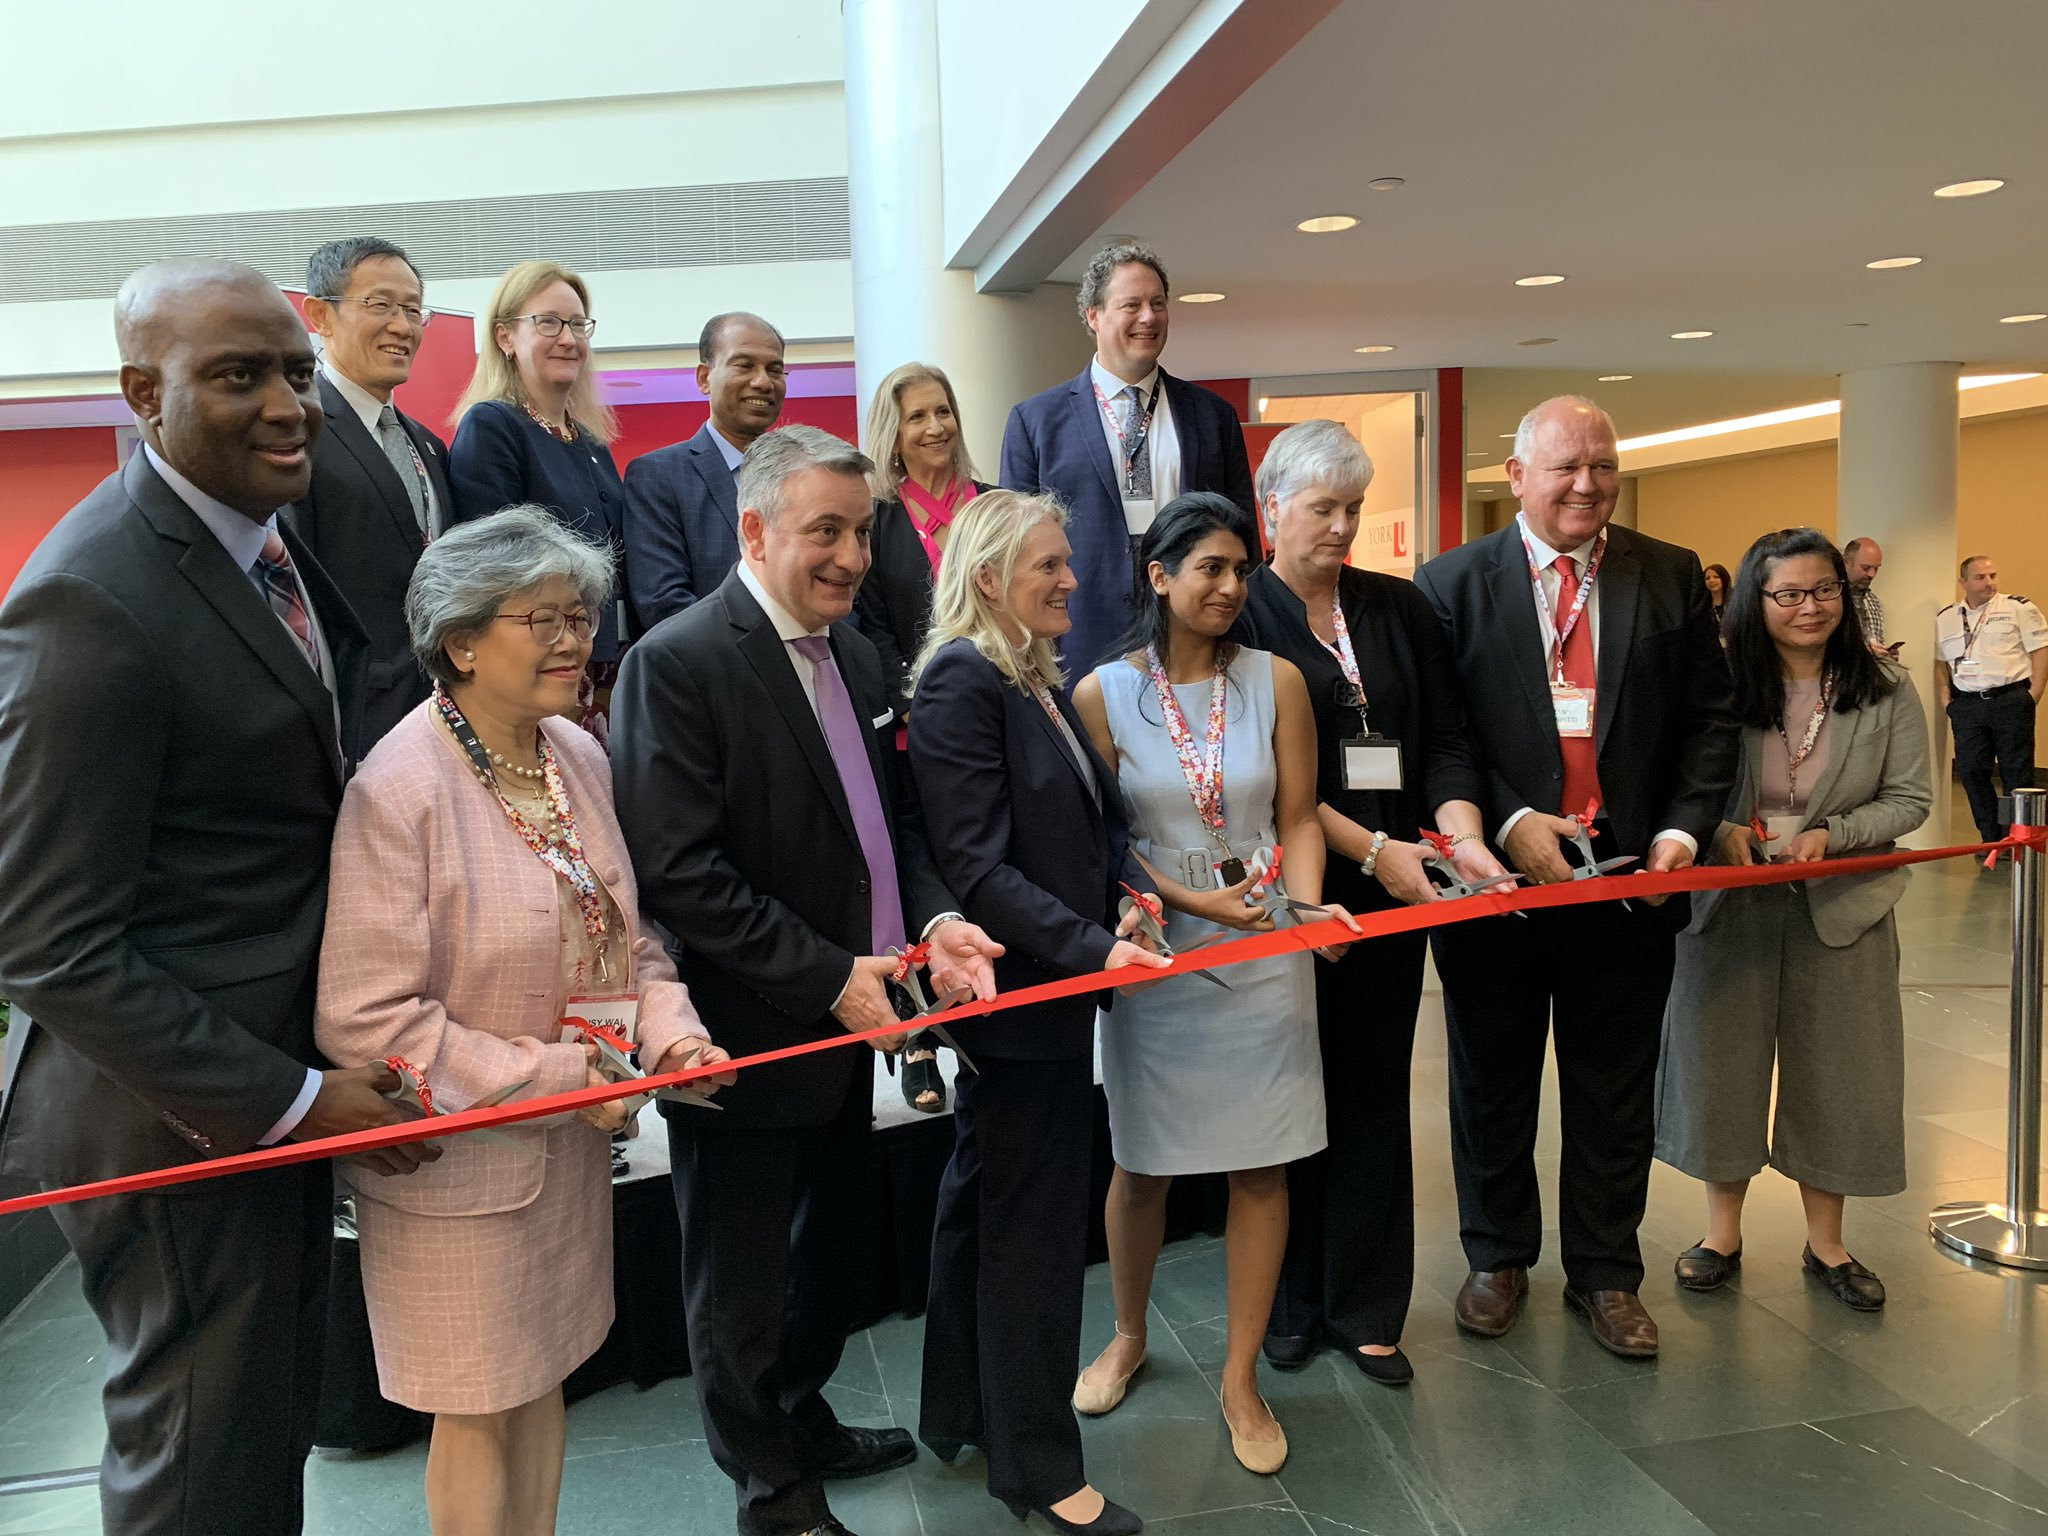 Representatives cut the Ribbon at York University space in Markham